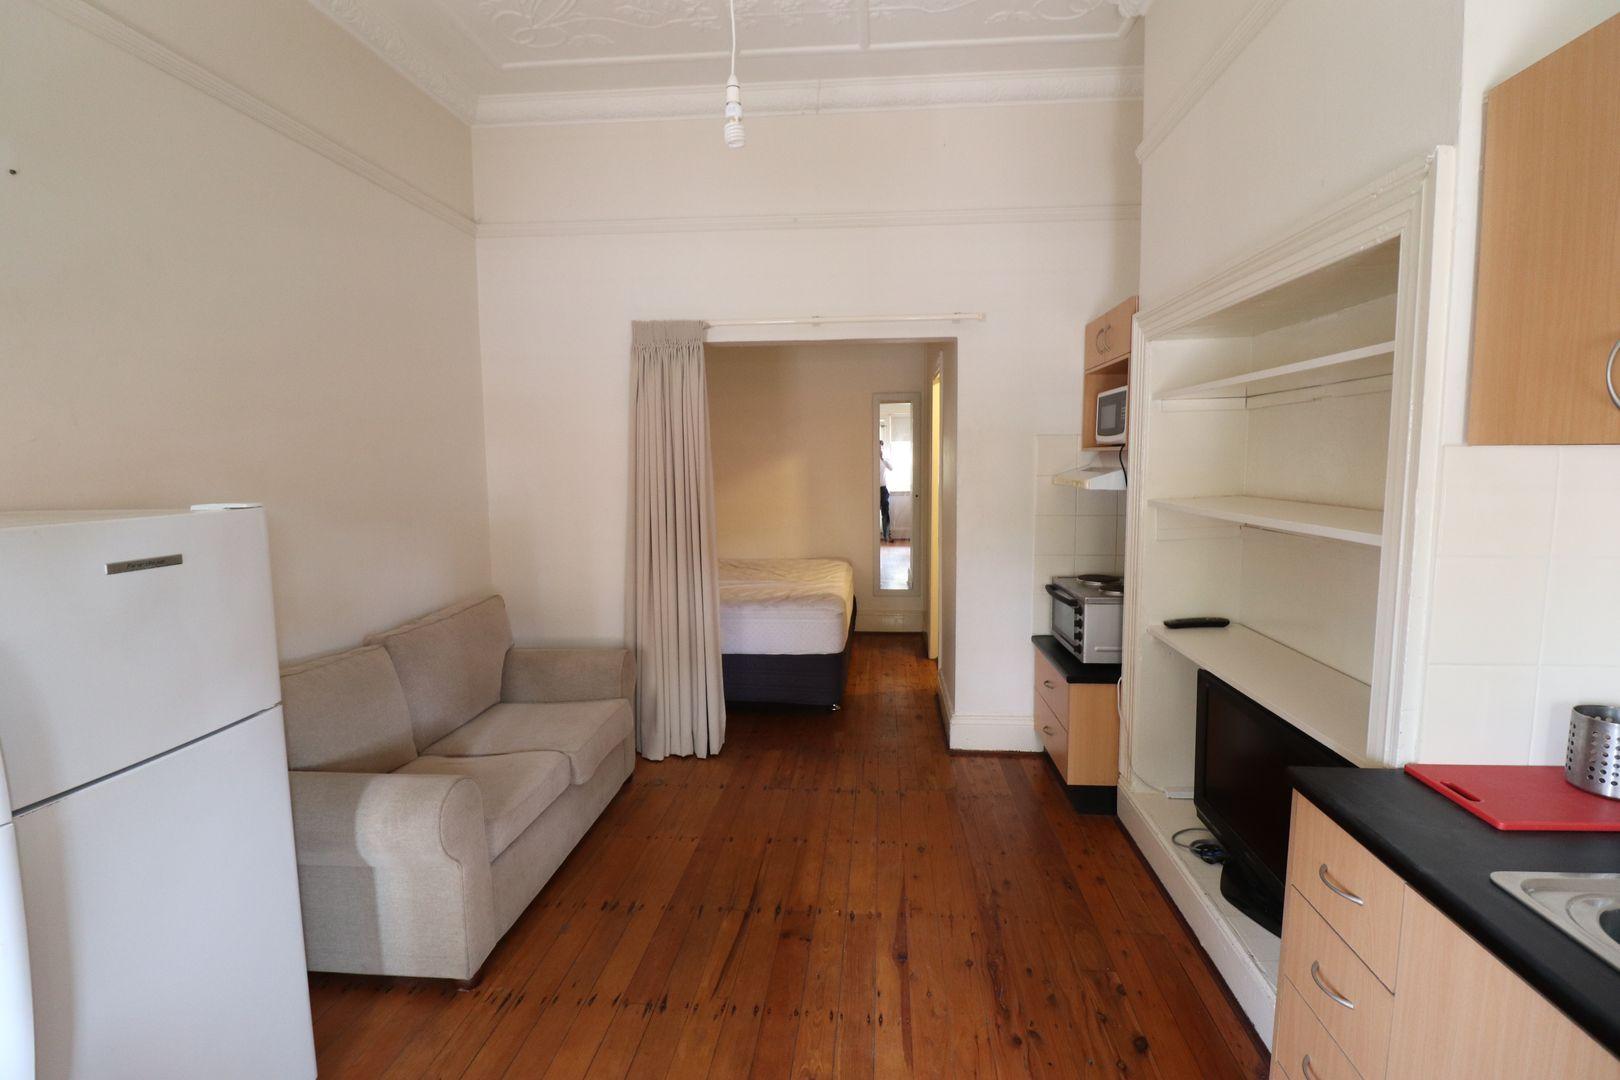 1A/43 Bondi Road, Bondi Junction NSW 2022, Image 0